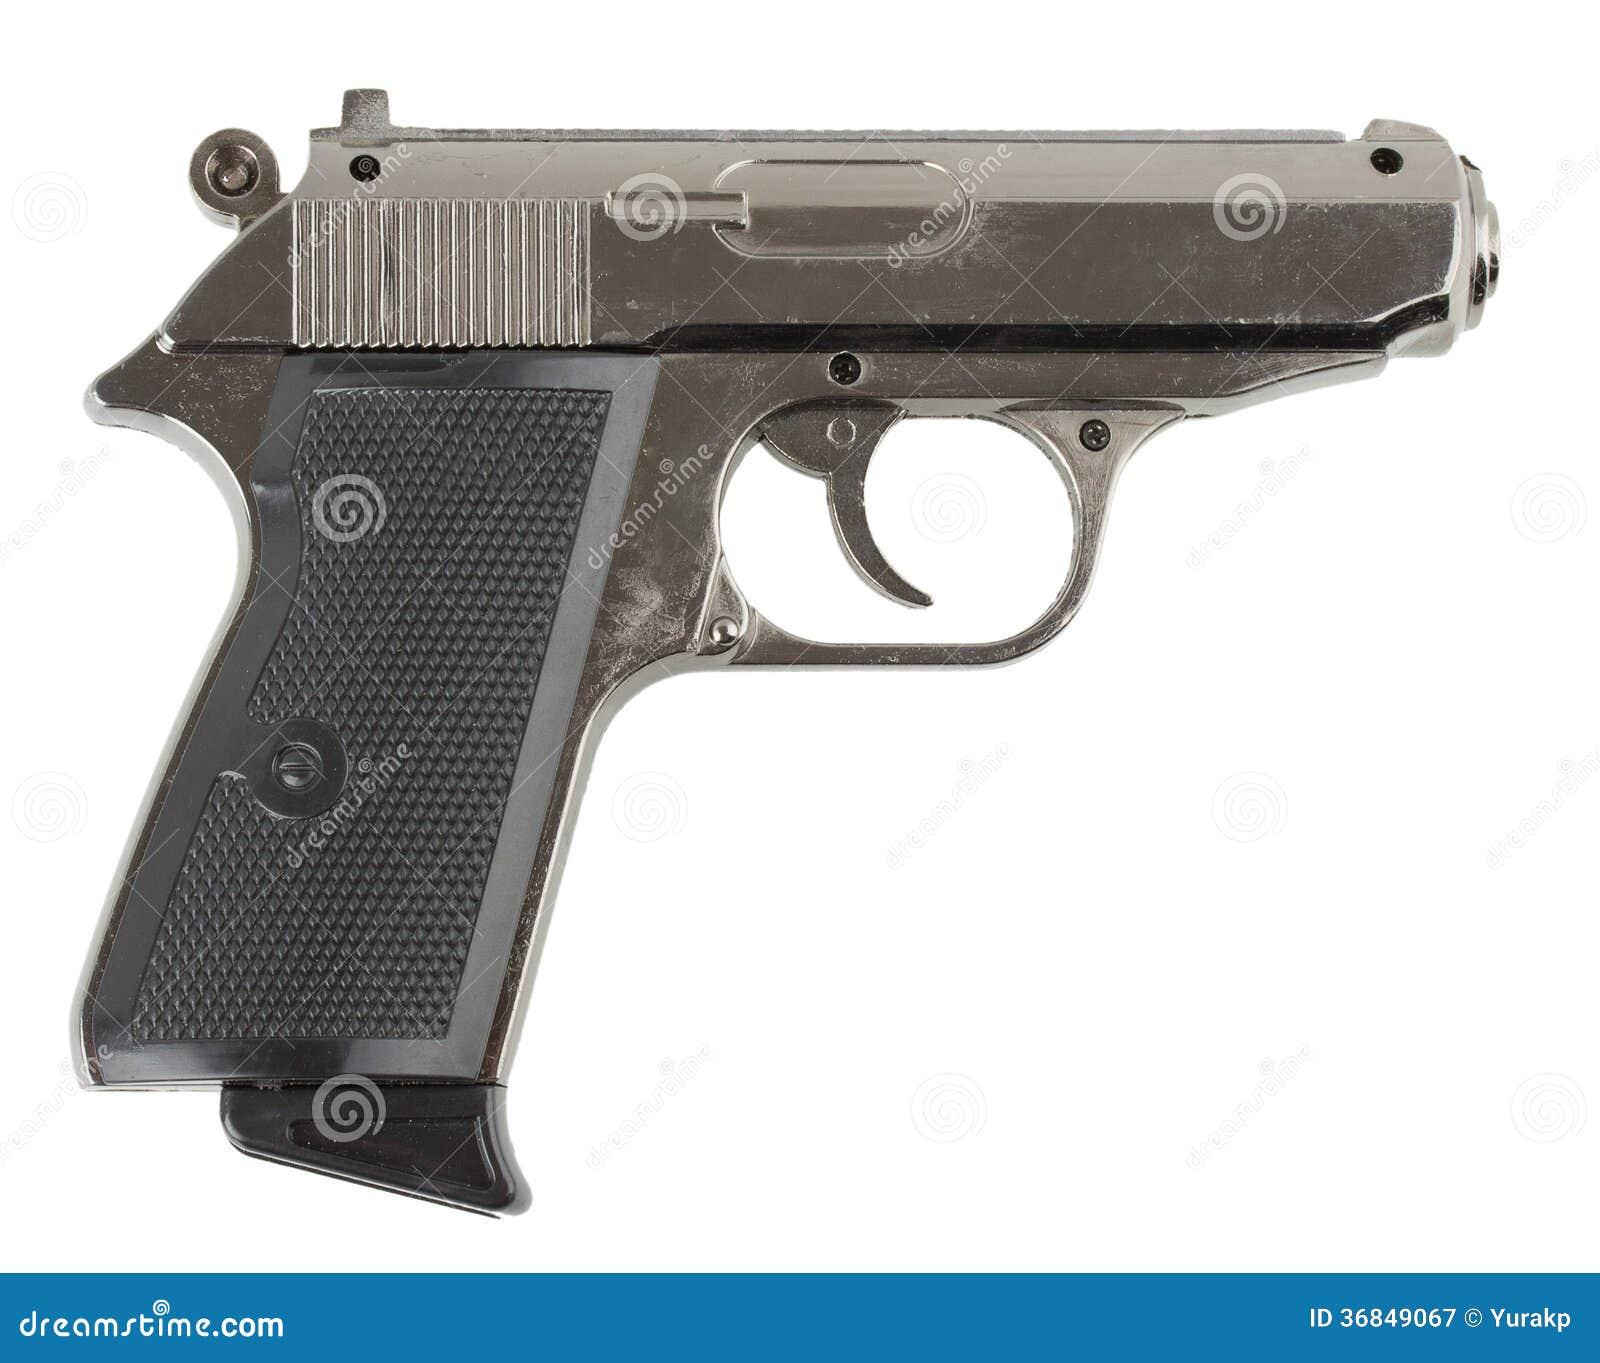 gun white background - photo #6